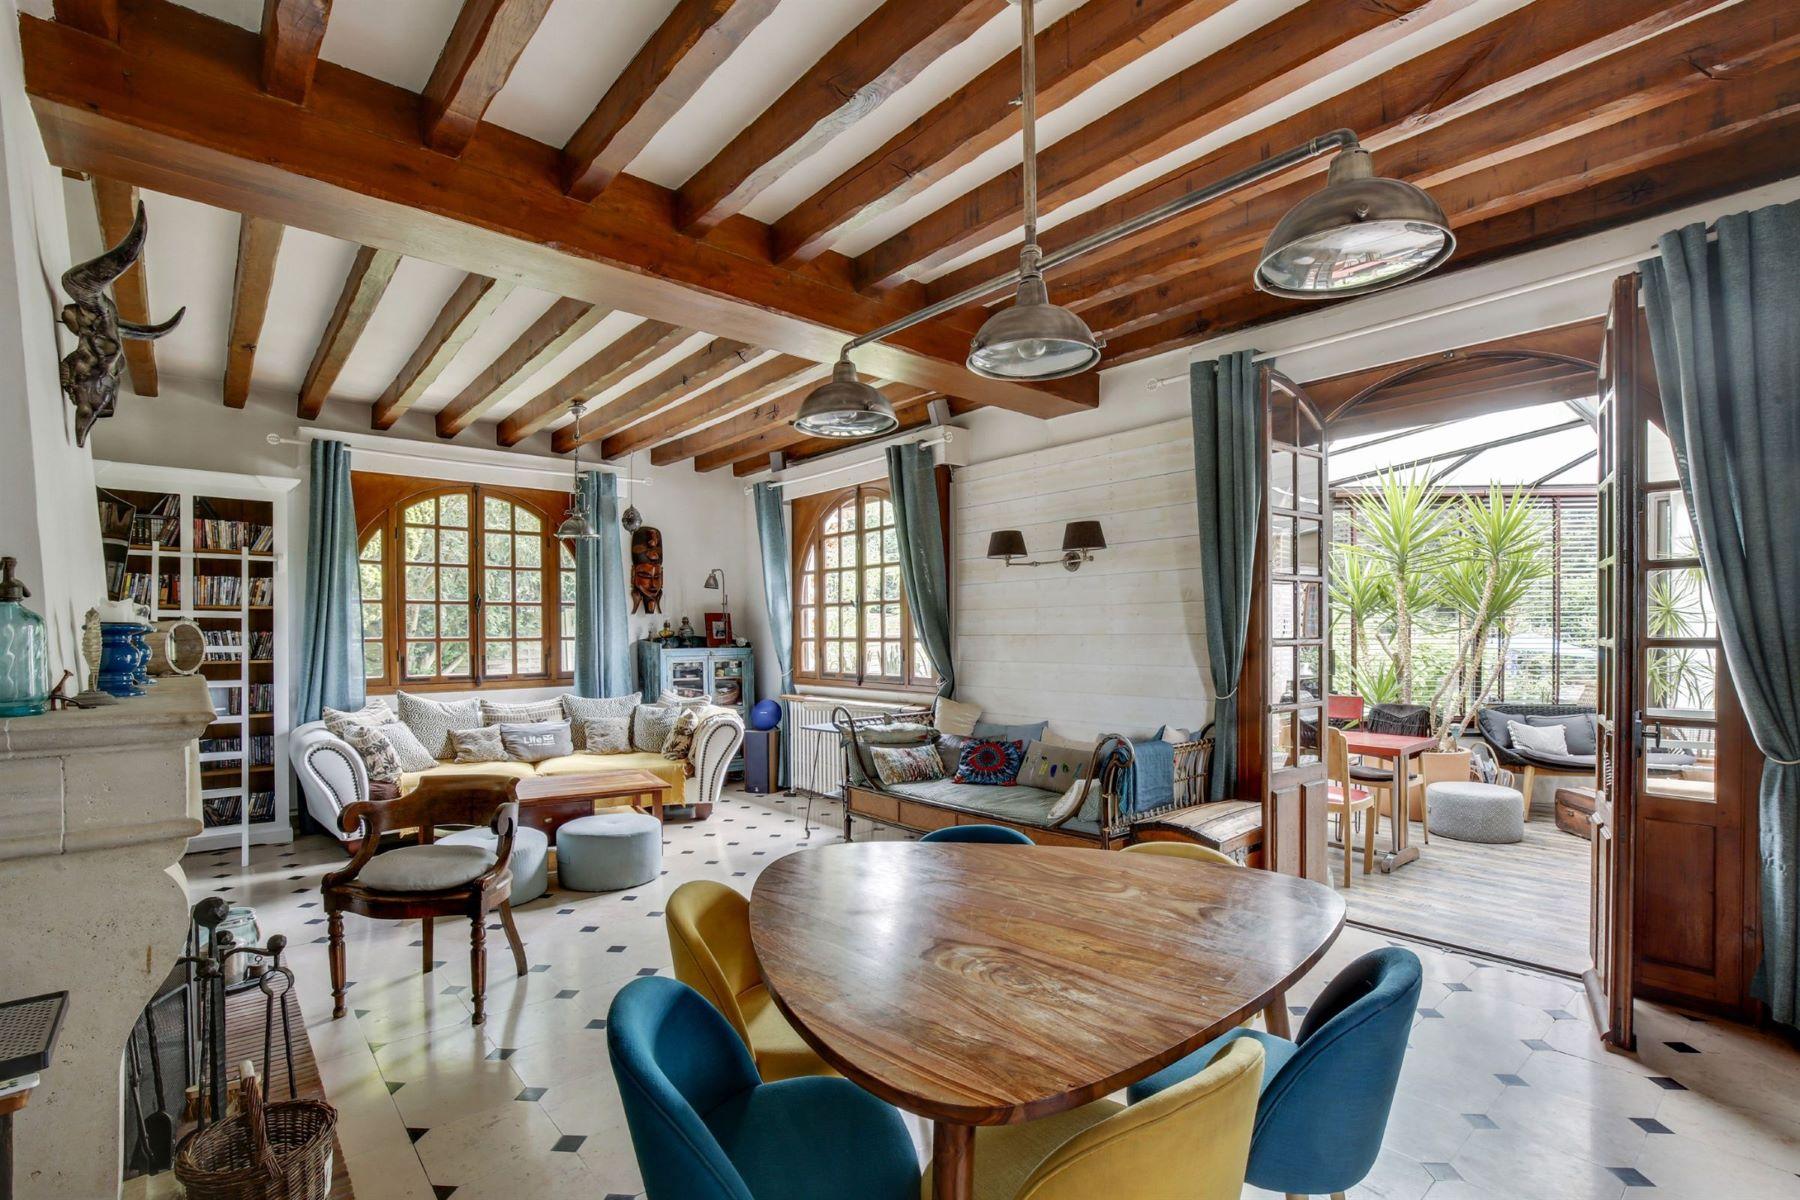 Single Family Homes for Active at Prestigious mansion in Bazoche sur Guyonne Bazoches Sur Guyonne, Ile-De-France 78490 France